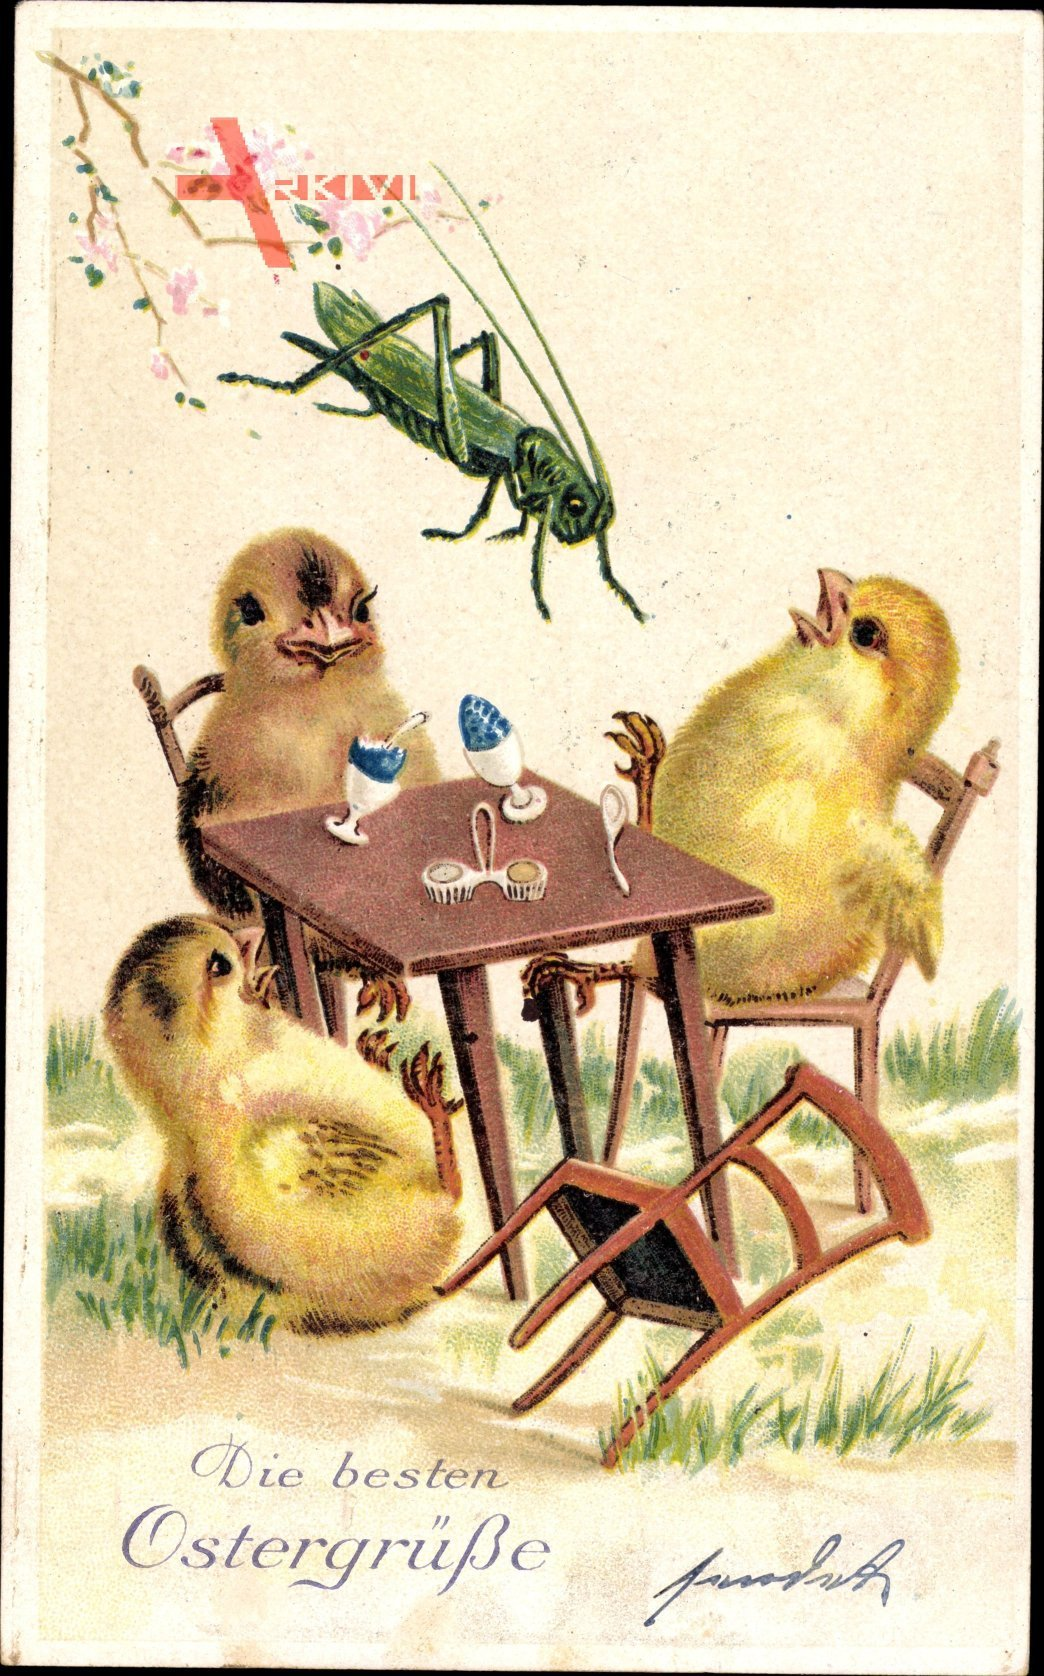 Glückwunsch Ostern, Küken am Tisch, Heuschrecke